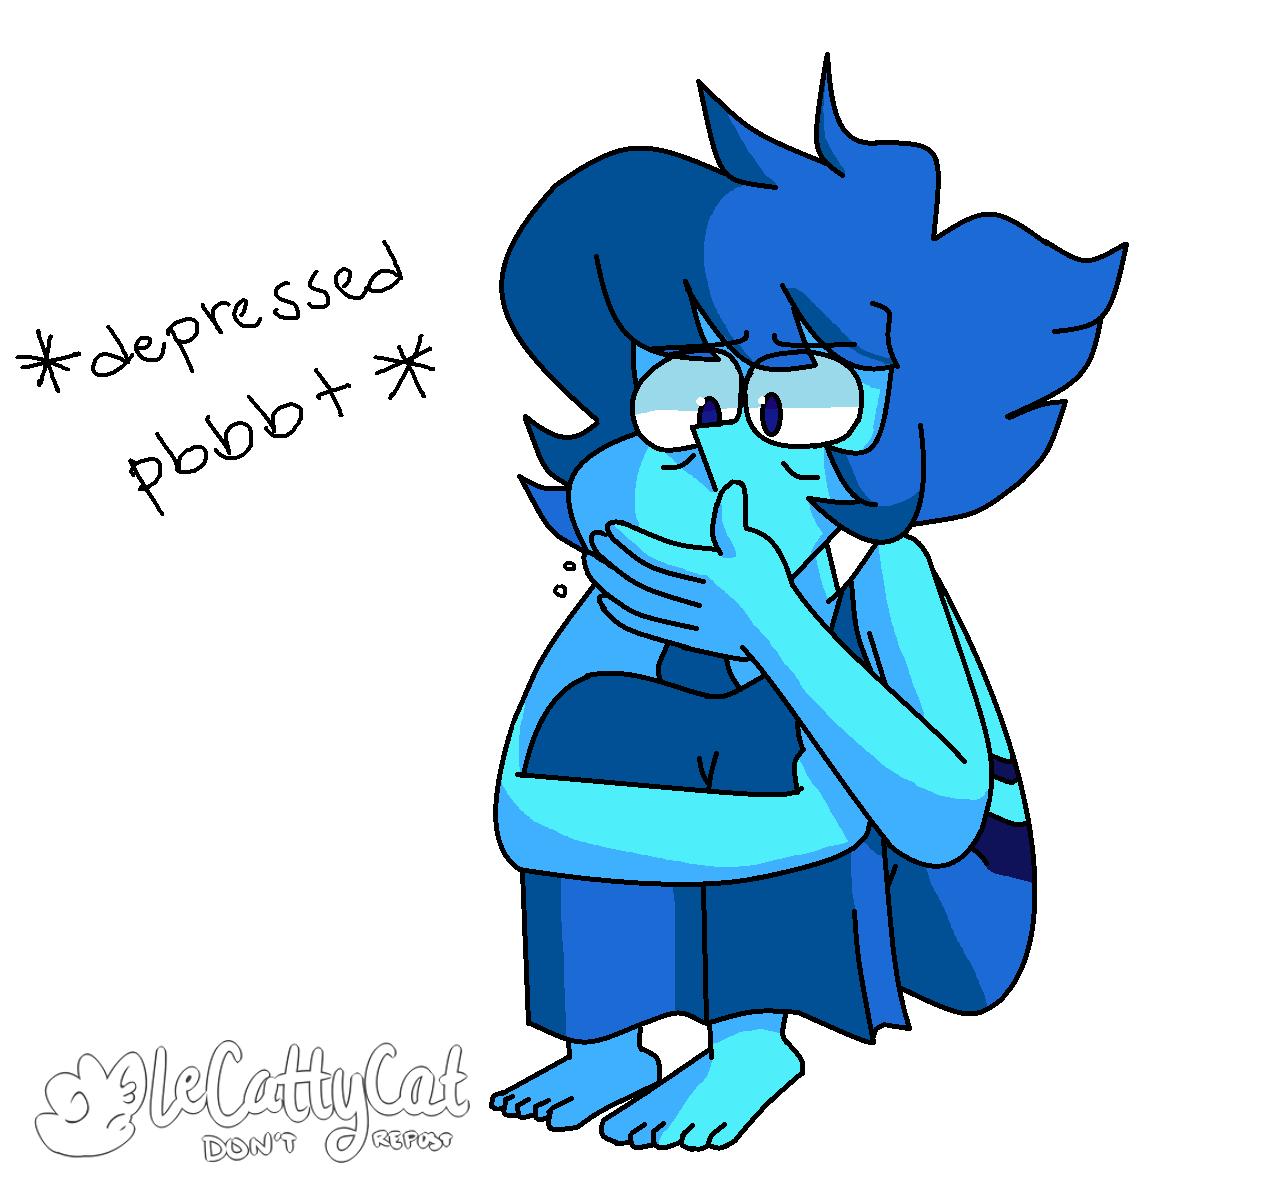 *depressed pbbbt*